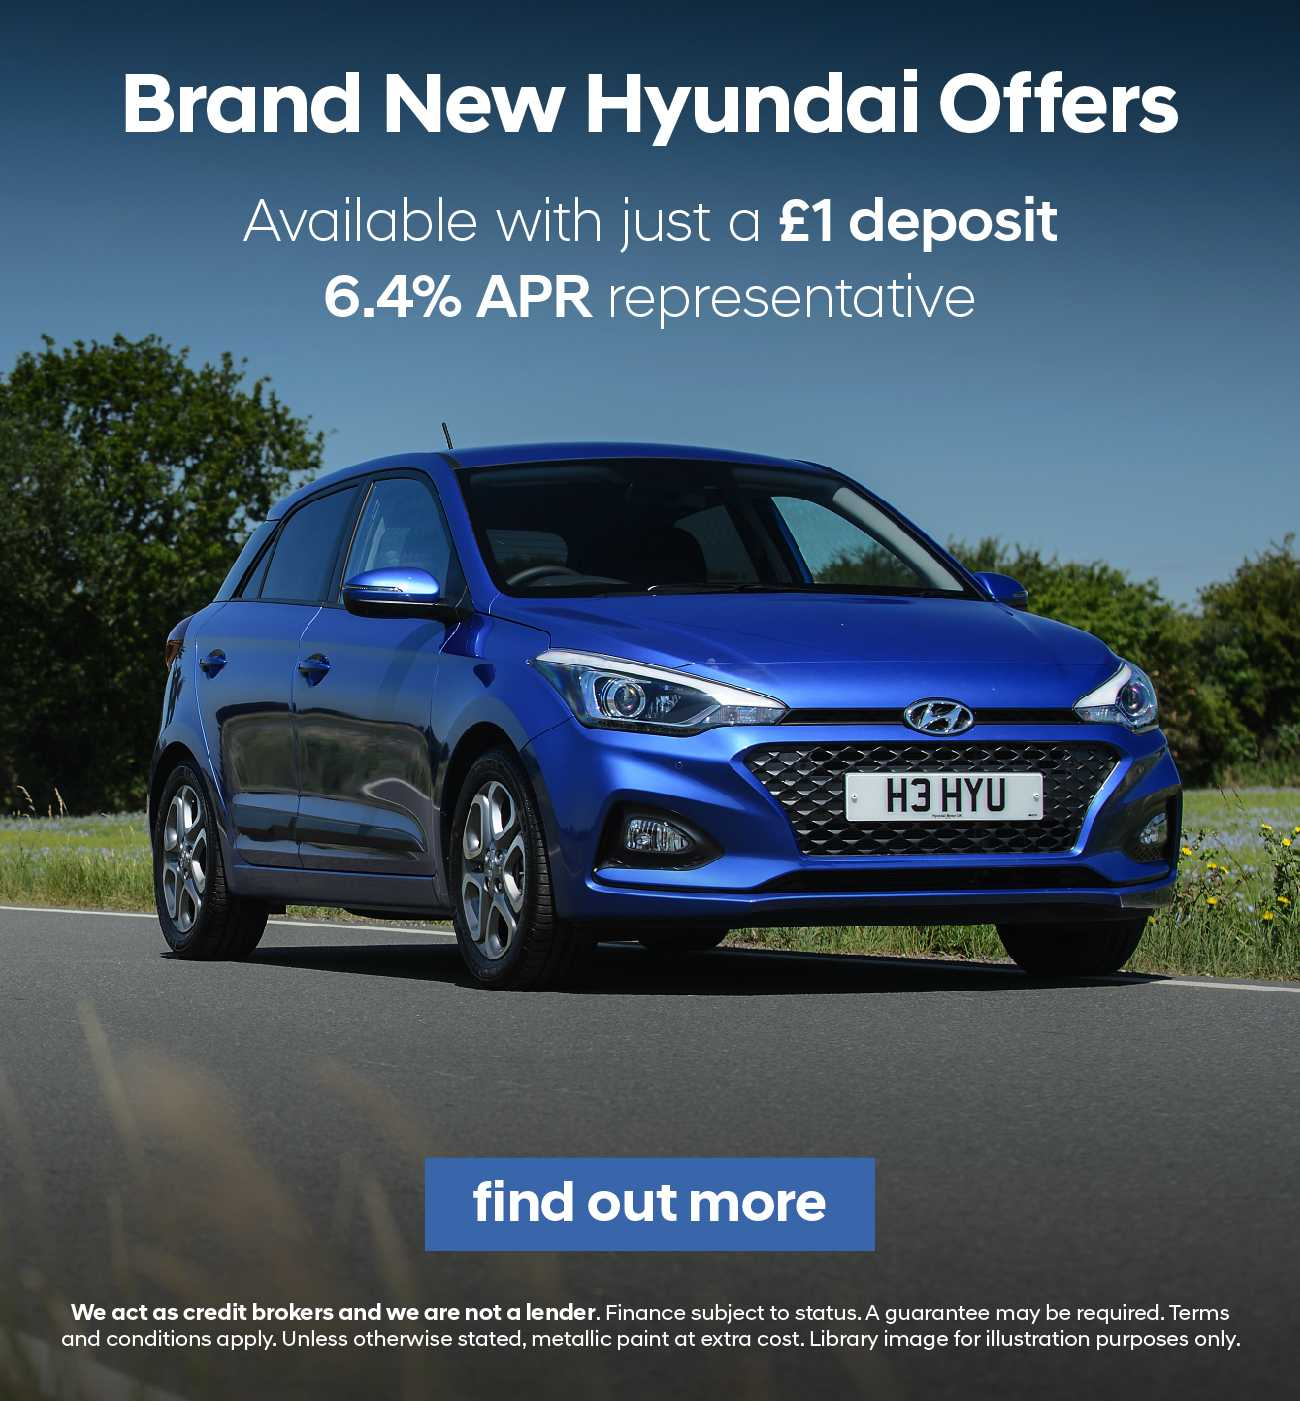 New Hyundai Cars For Sale